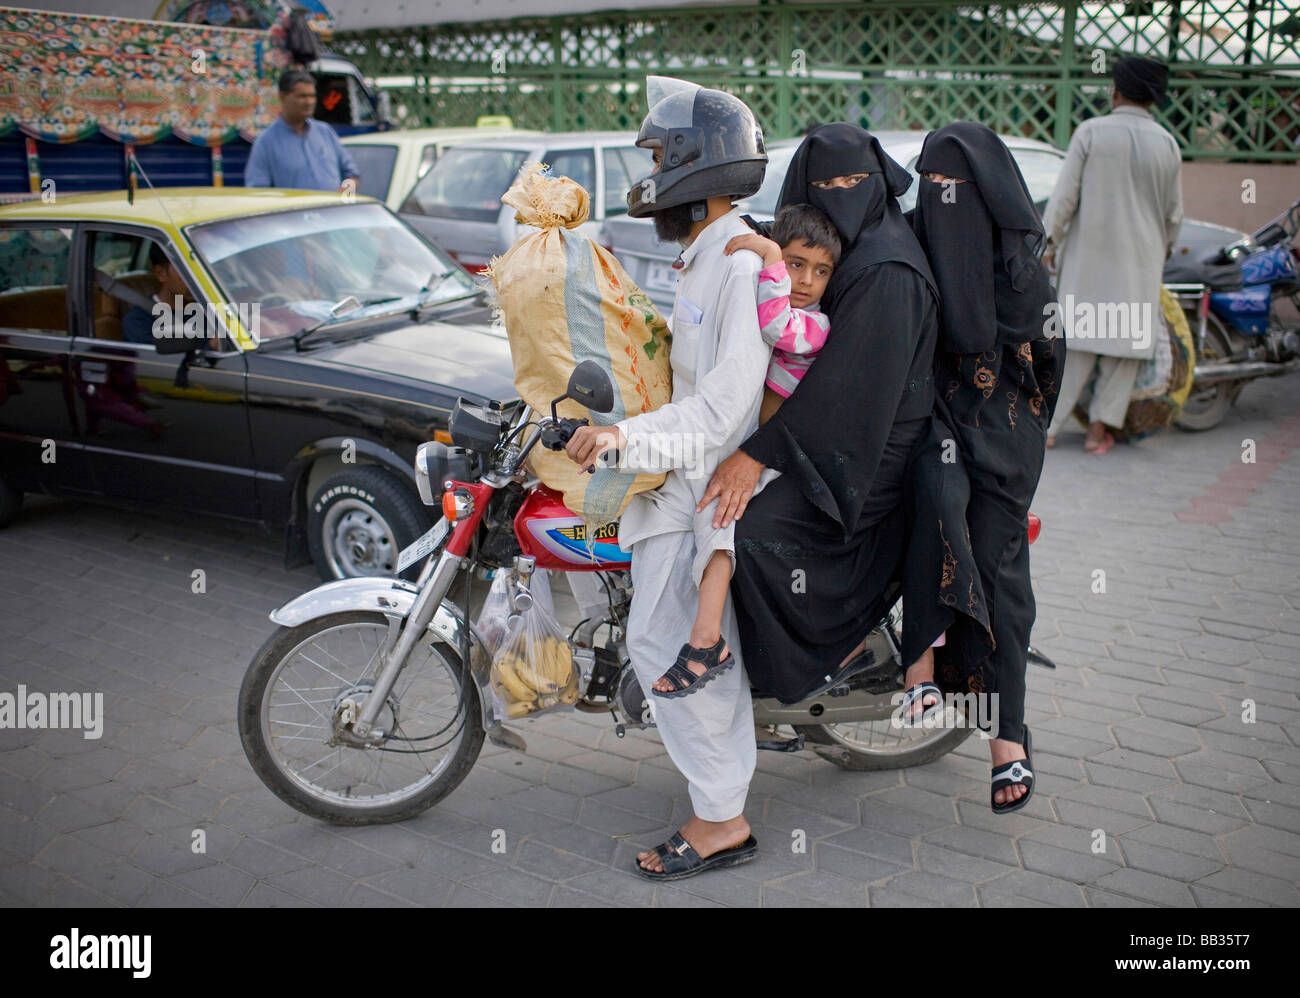 Family on a motorbike Islamabad Pakistan - Stock Image